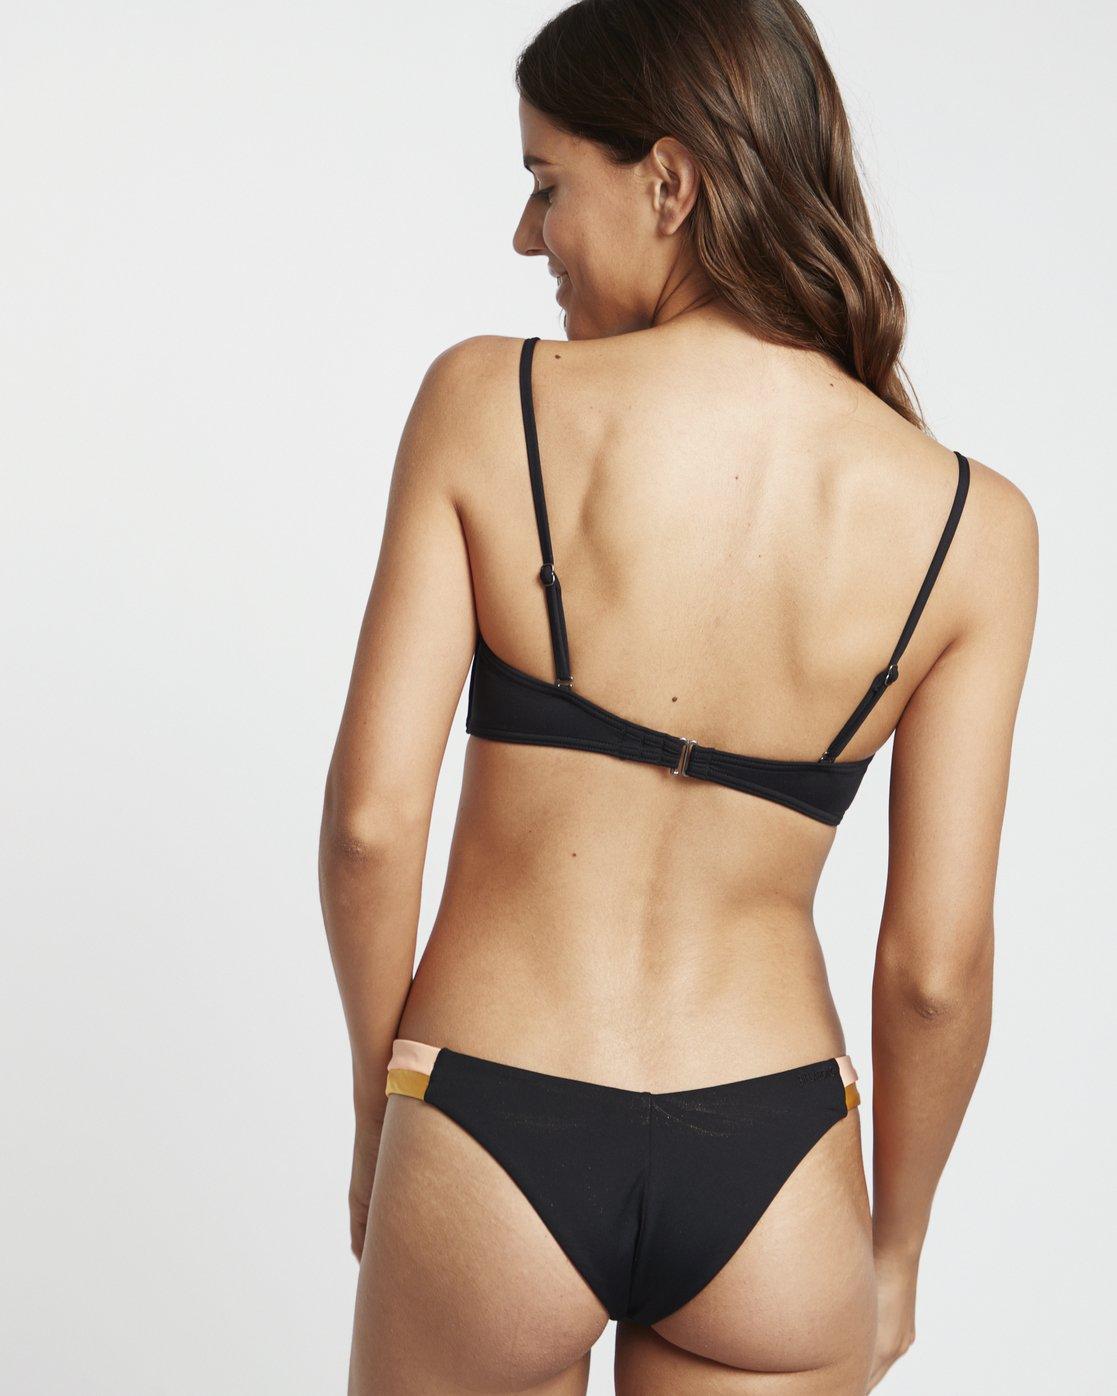 INVOLAND Bikini da Spiaggia da Surf a Vita Alta Regolabili Pantaloncini da Nuoto da Donna